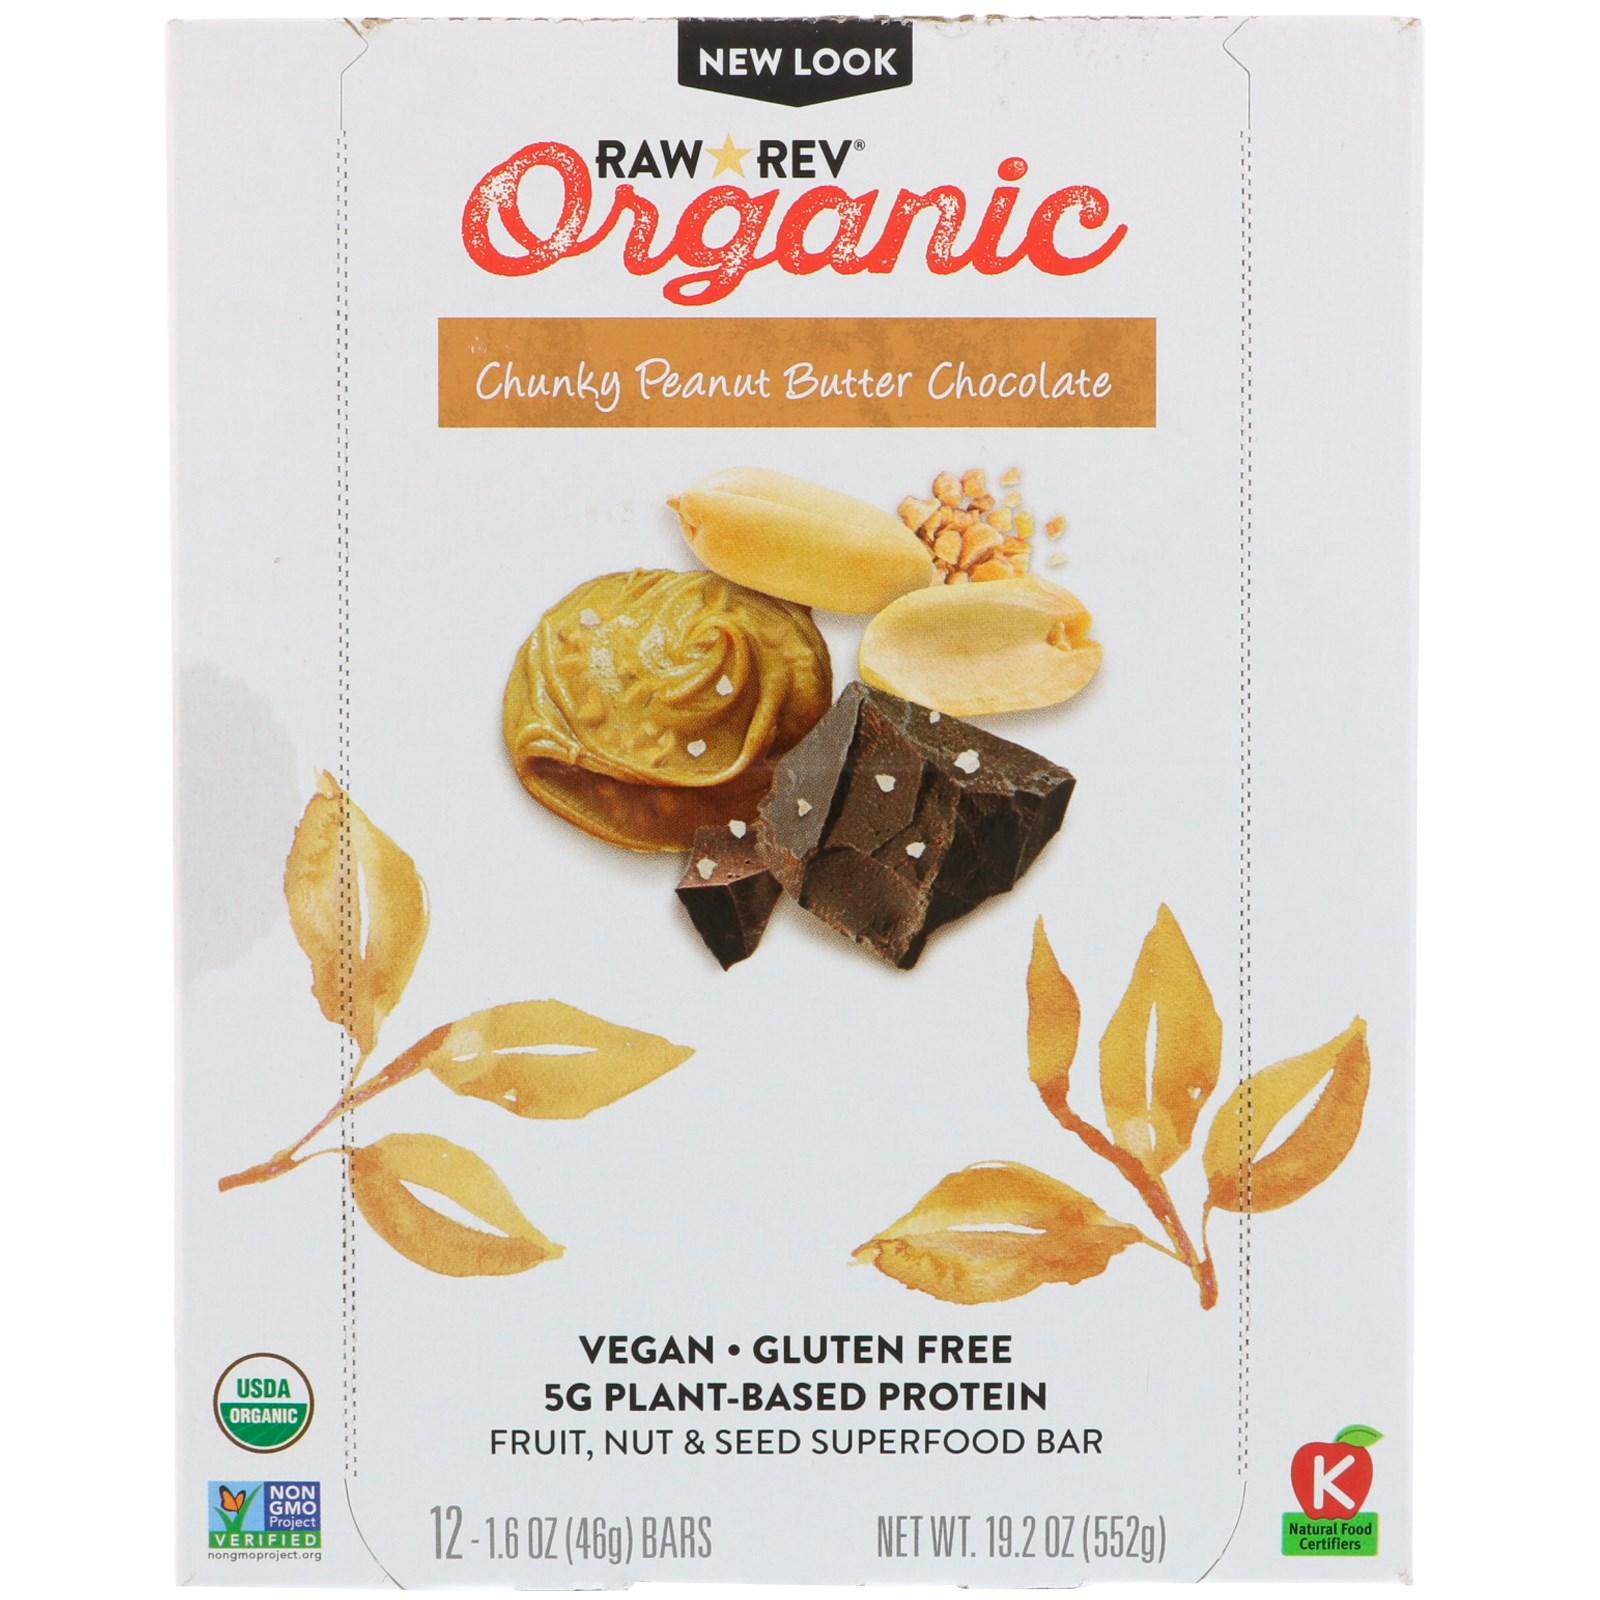 Raw Revolution, Organic, Chunky Peanut Butter Chocolate, 12 Bars, 1.6 oz (46 g) Each